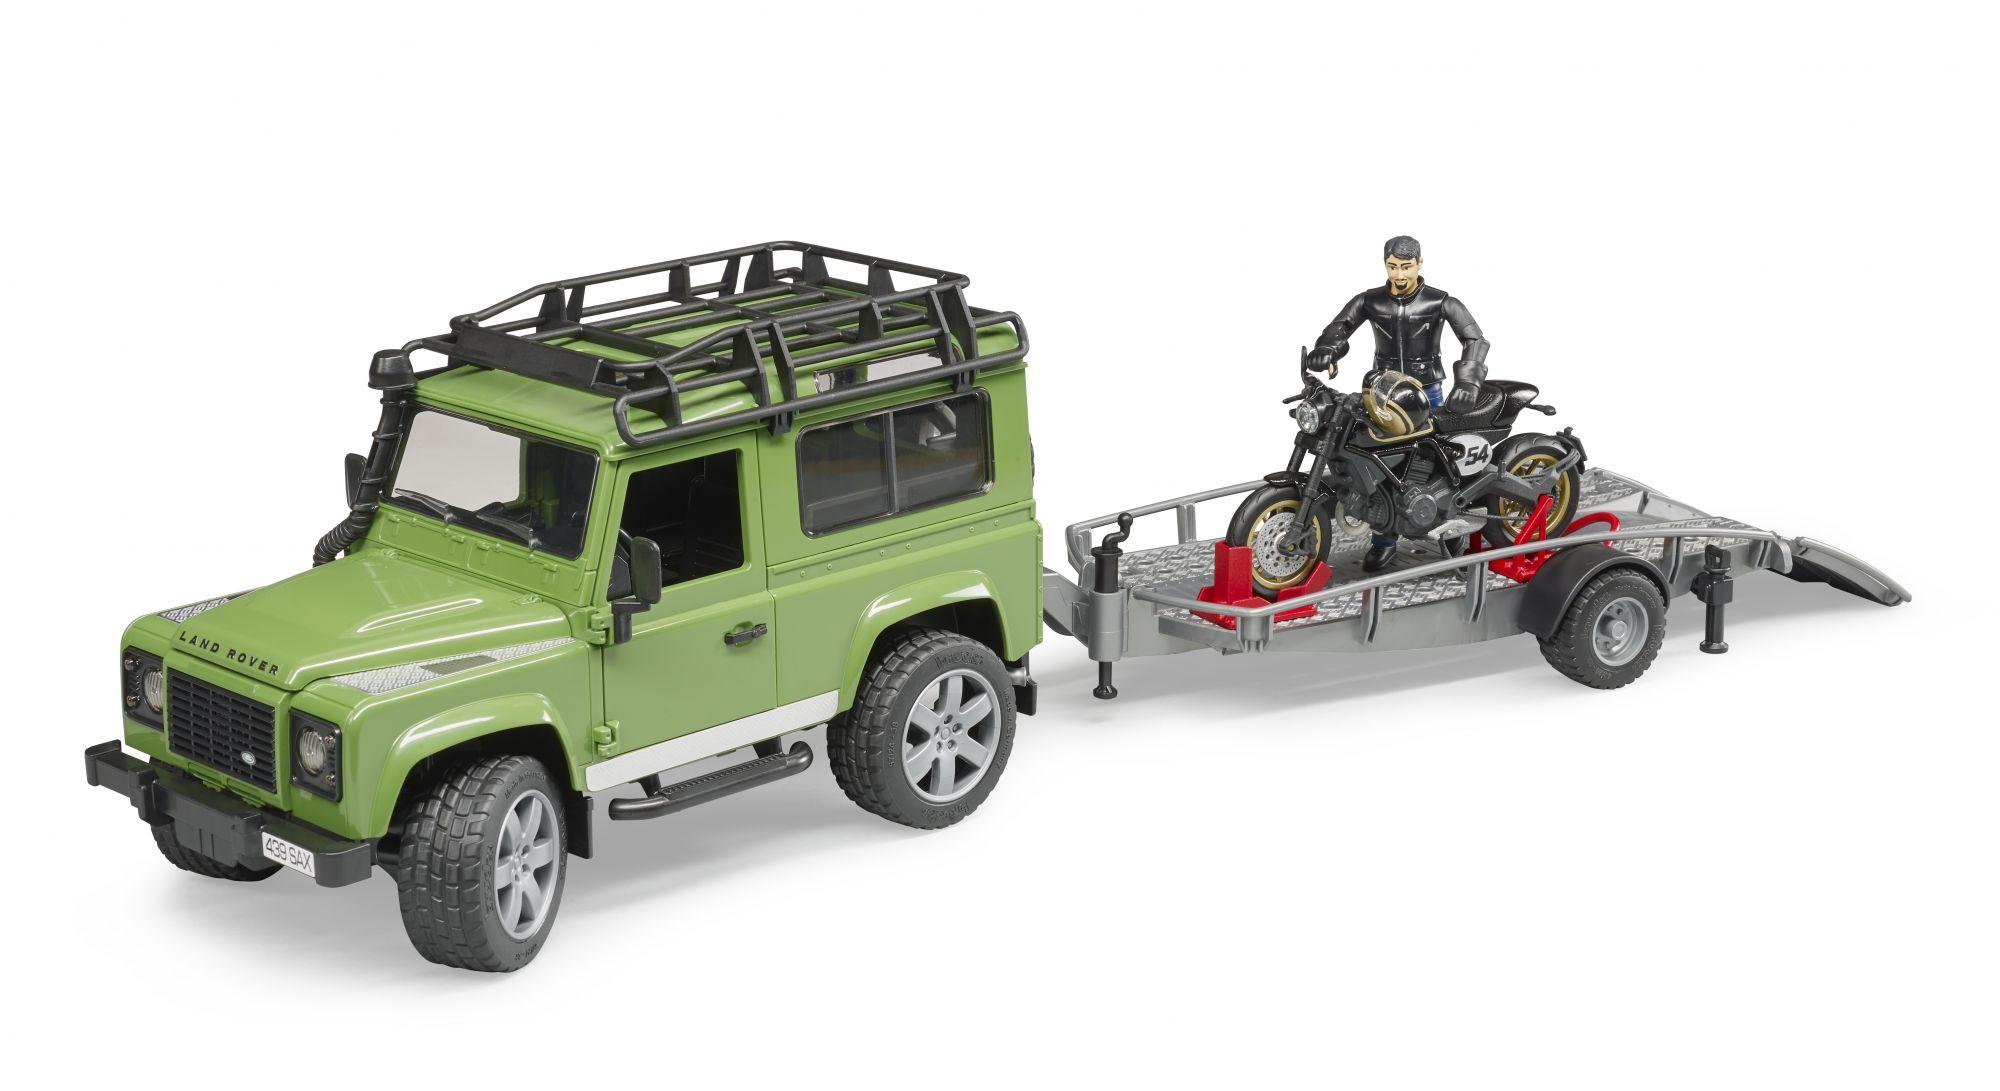 Bruder 02598 - Land Rover met aanhanger en Ducati motor